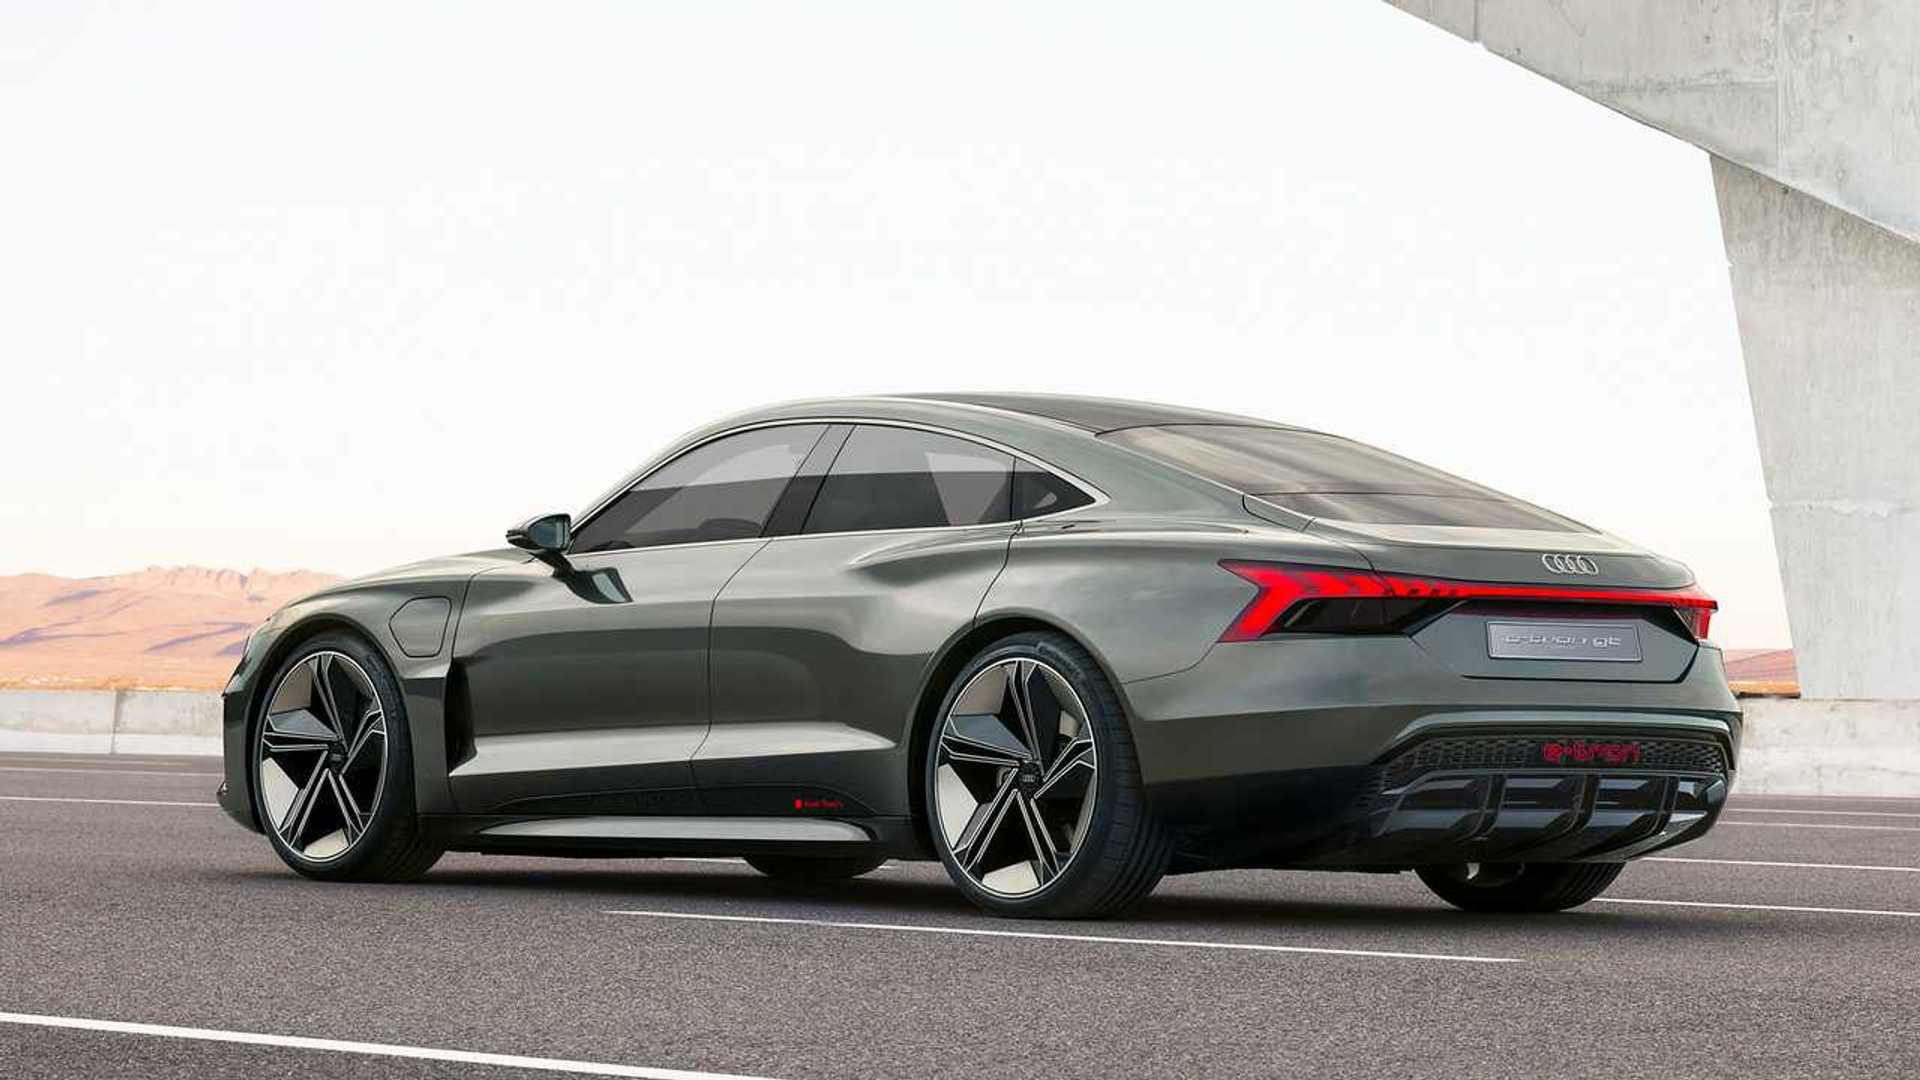 Audi E Tron Gt Concept 2019 Camino A La Realidad Eléctrica